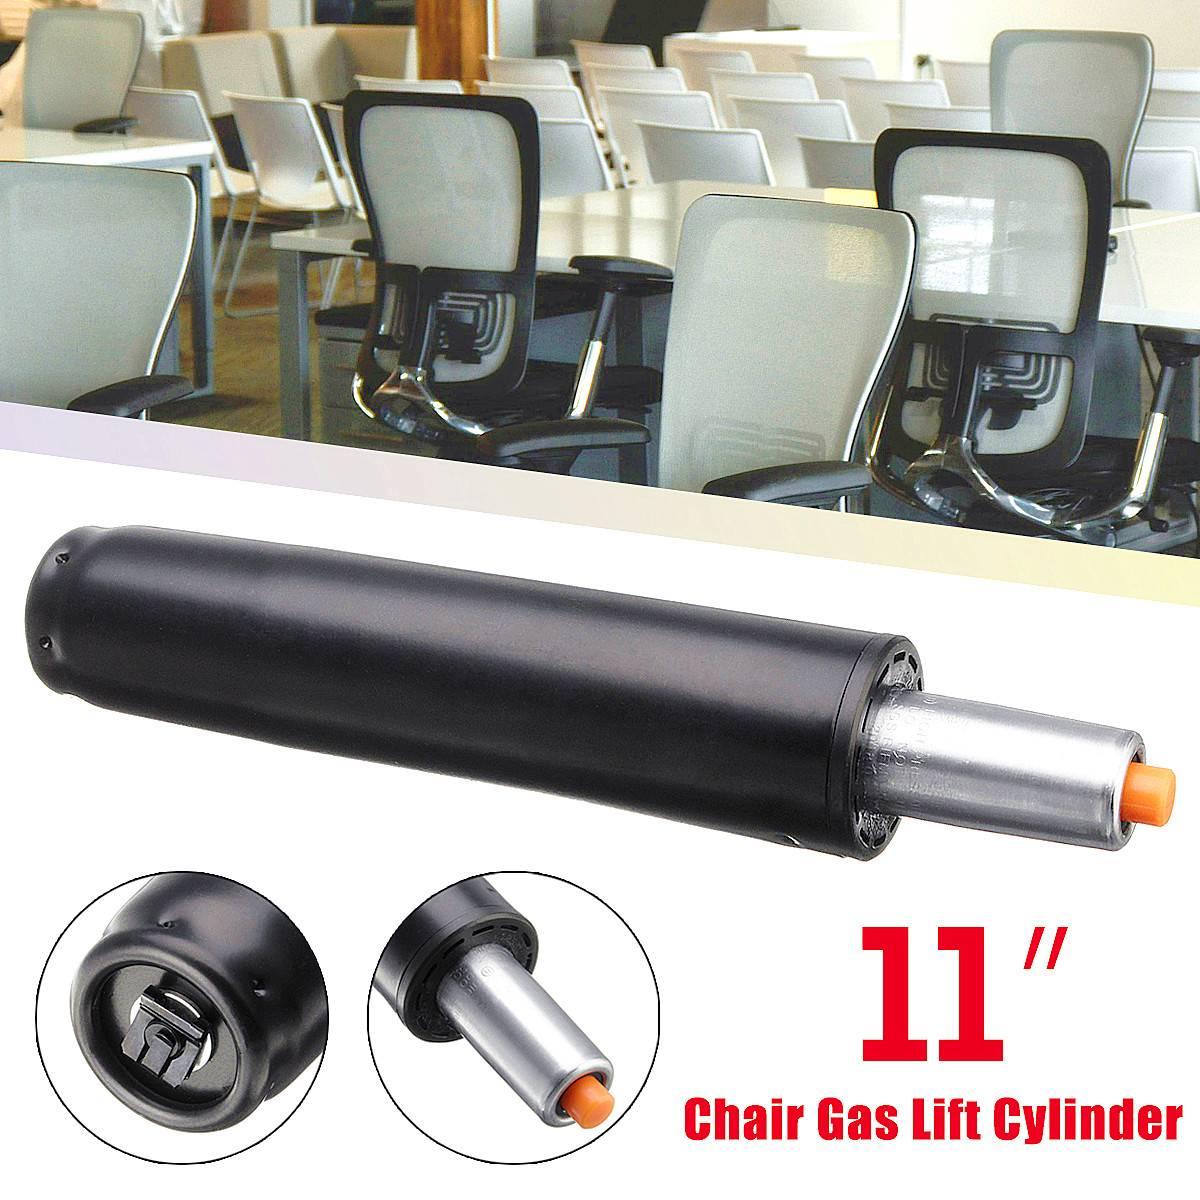 Pneumatic Rod Gas Lift Cylinder Chair